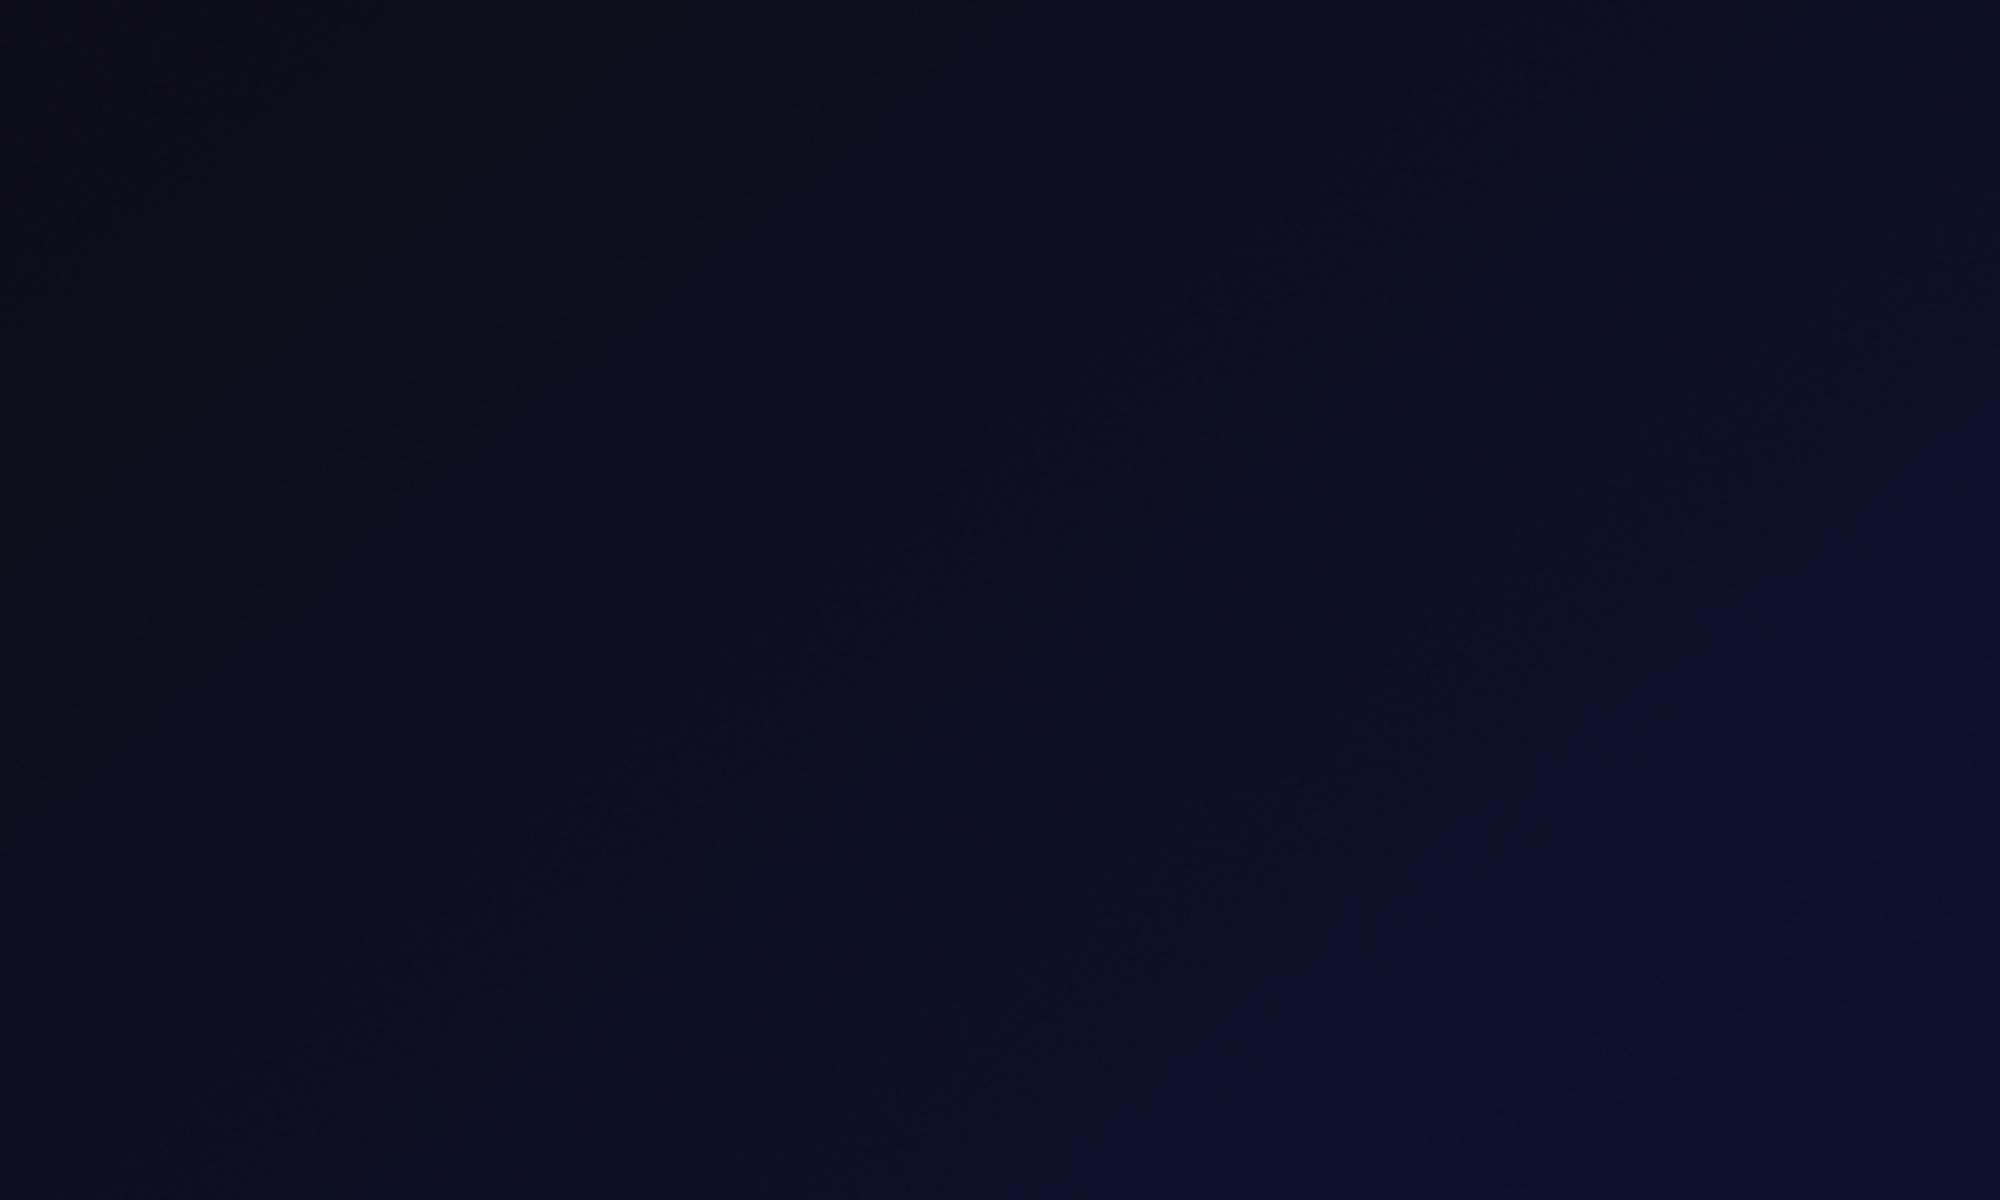 Norsk meteornettverk